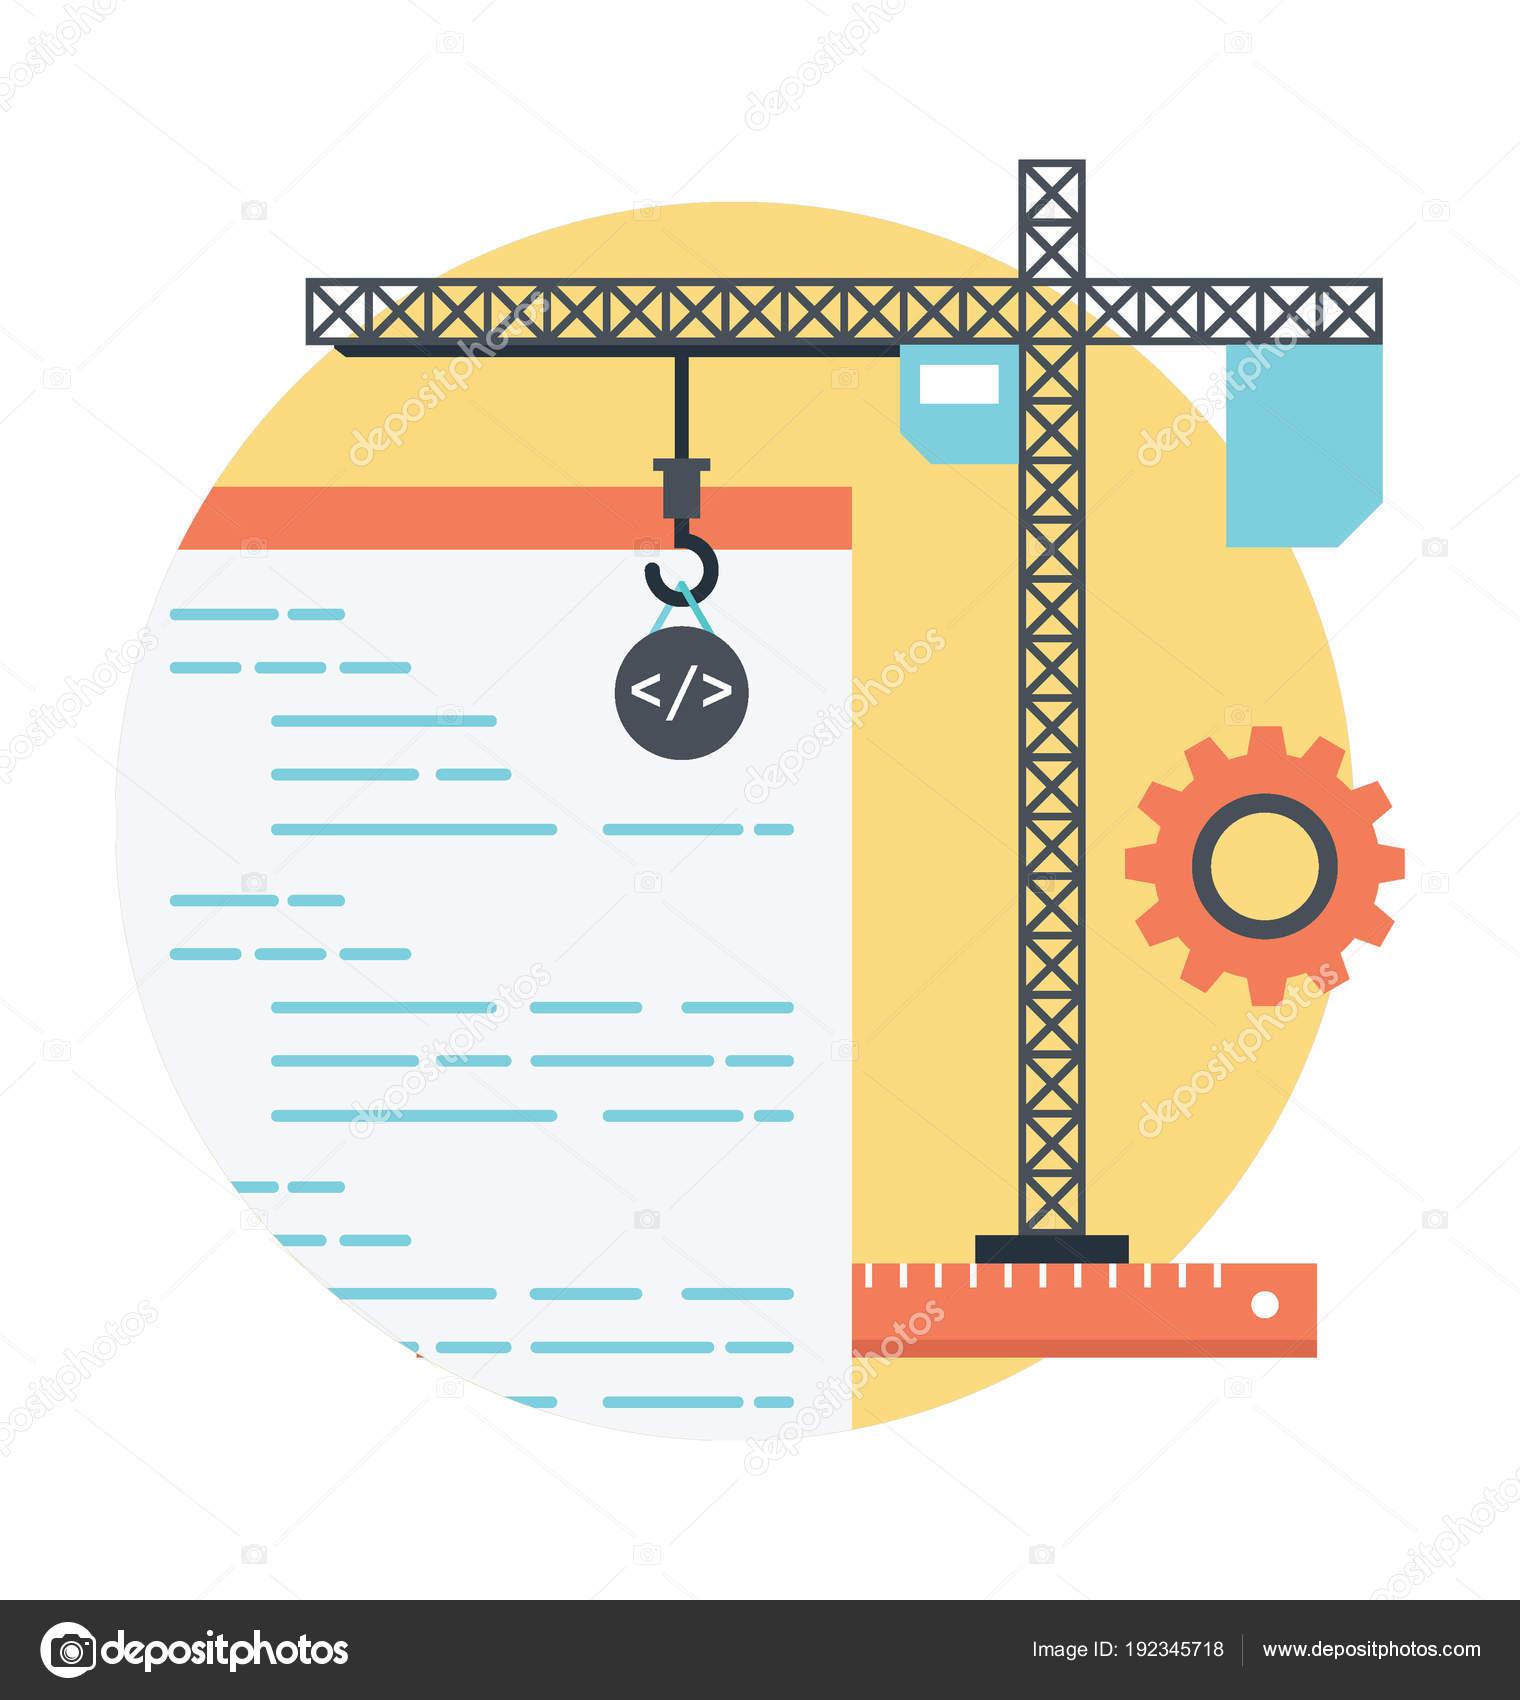 Шаблон презентации страницы